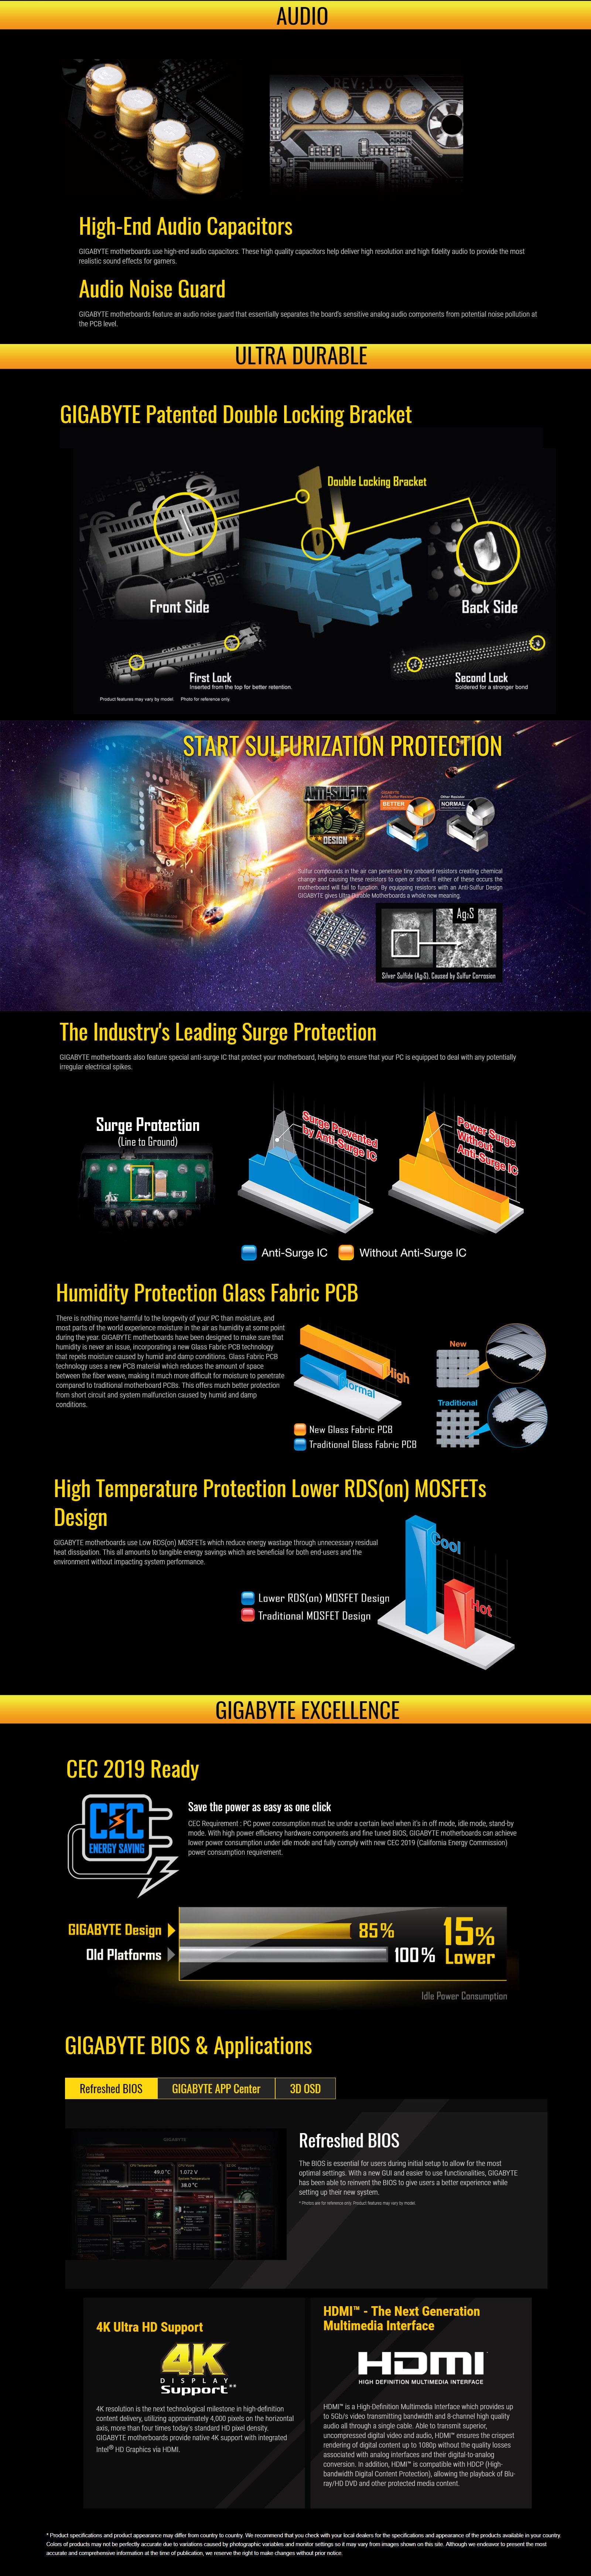 Gigabyte H310M-H-2 0 LGA 1151 Micro ATX Motherboard